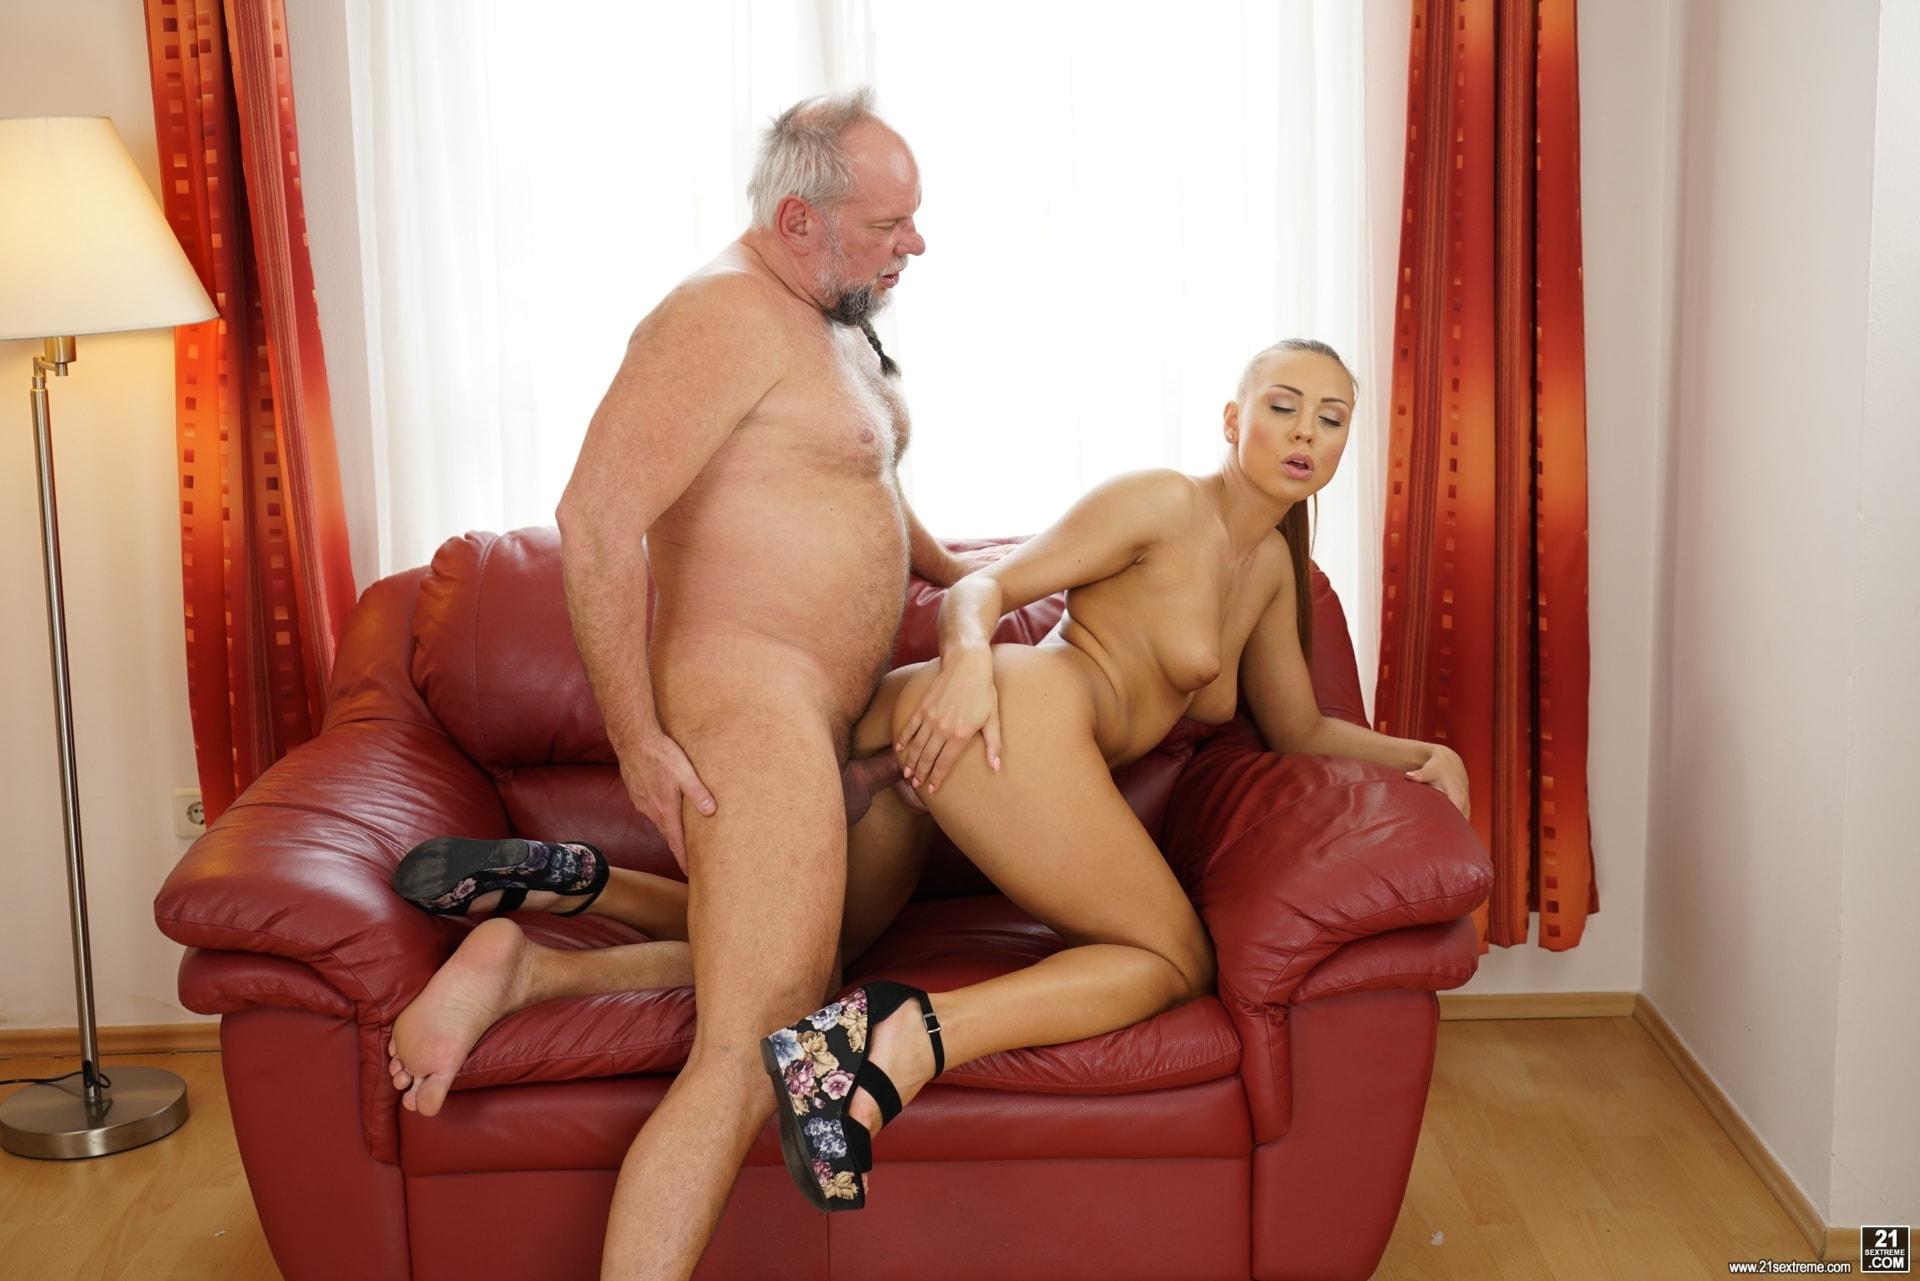 21Sextury 'Pleasing Naughty Grandpa' starring Ornella Morgan (Photo 276)